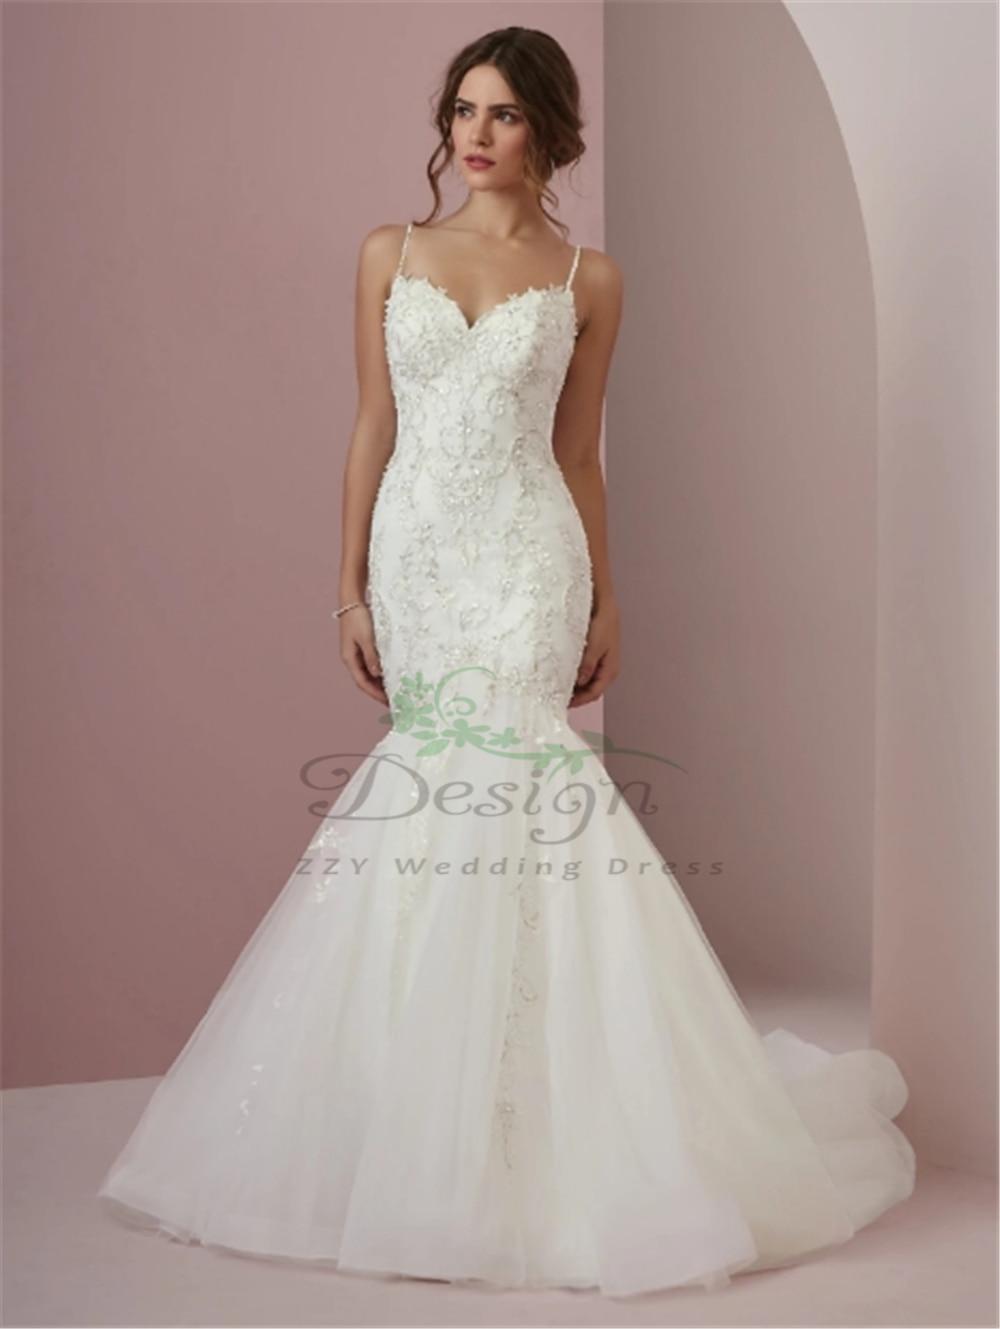 Charming White Tulle Embroidery Beading Vestido De Noiva Sereia Spaghetti Straps Dropped Sweep Train Mermaid Wedding Dresses